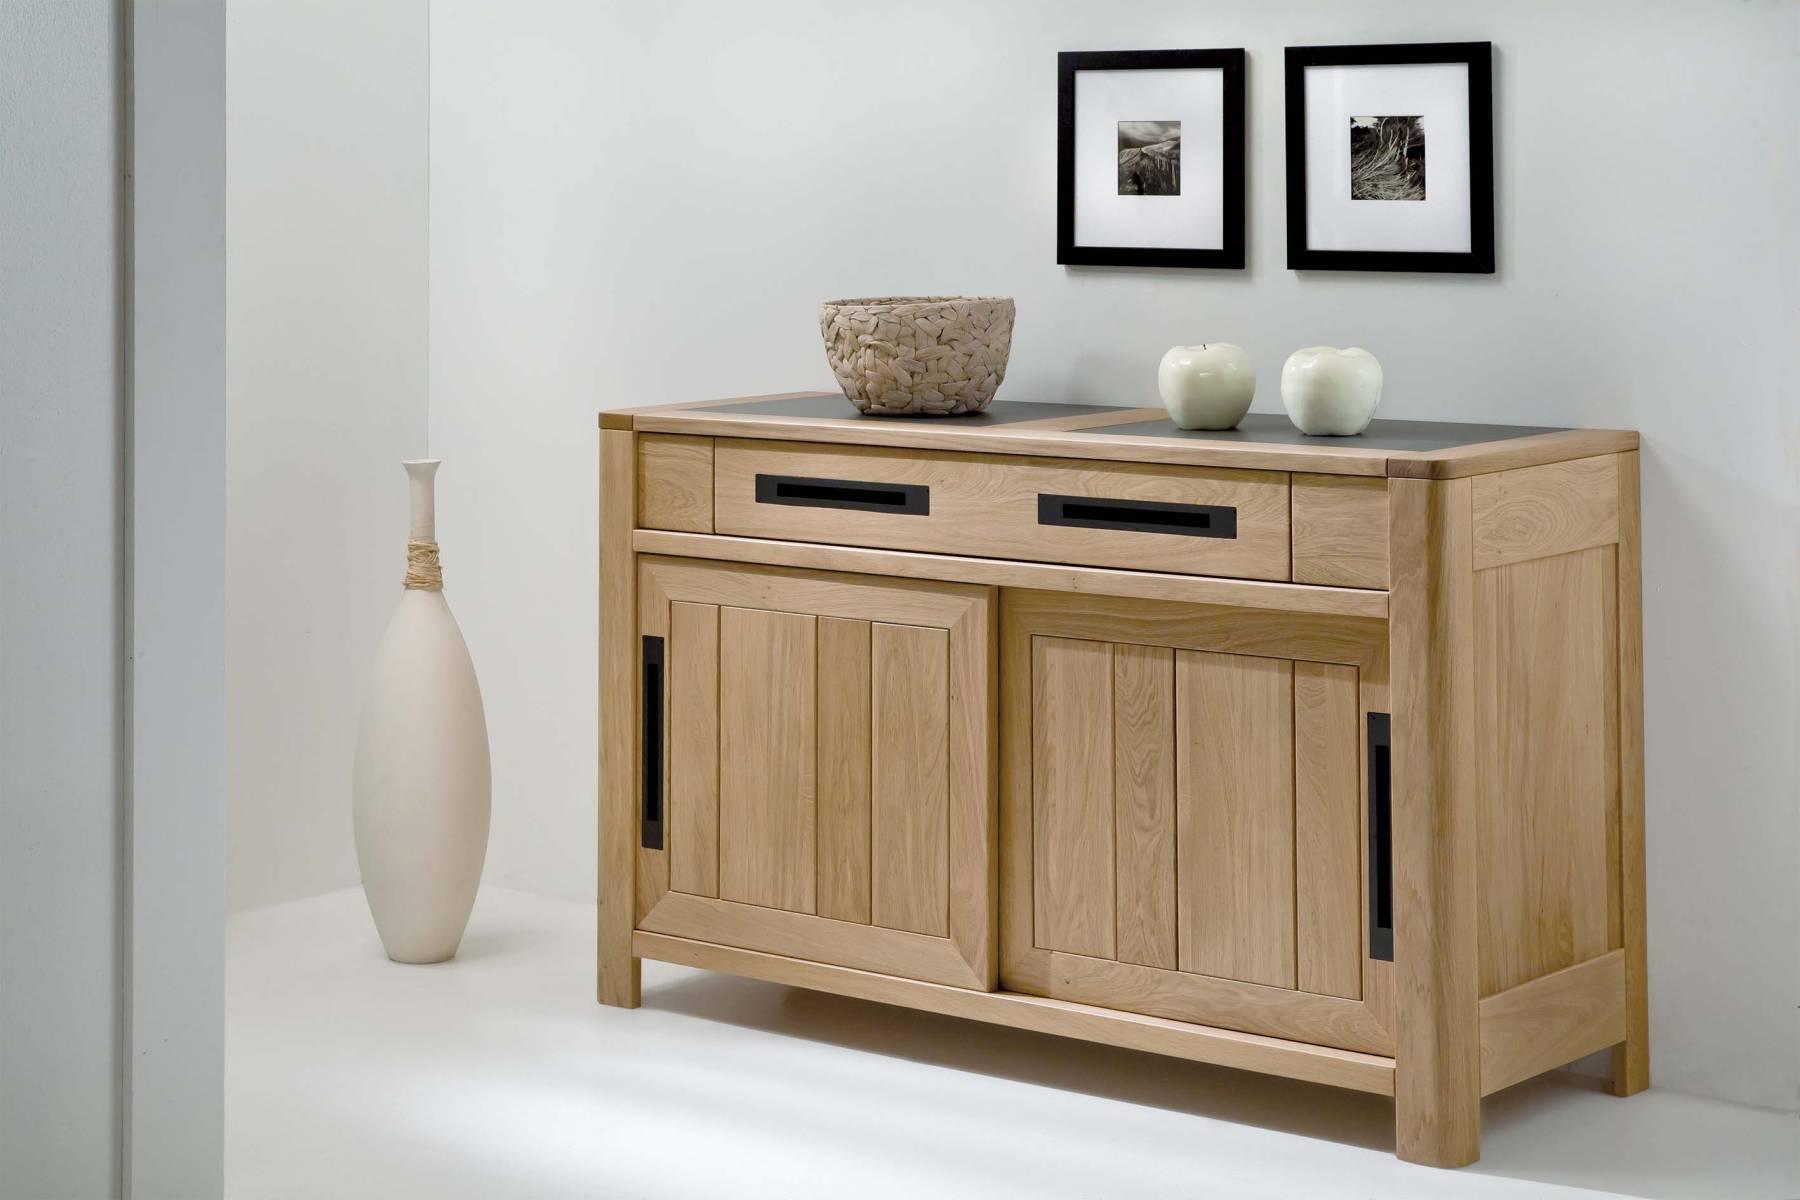 bahut deauvil 2 portes bois deco. Black Bedroom Furniture Sets. Home Design Ideas